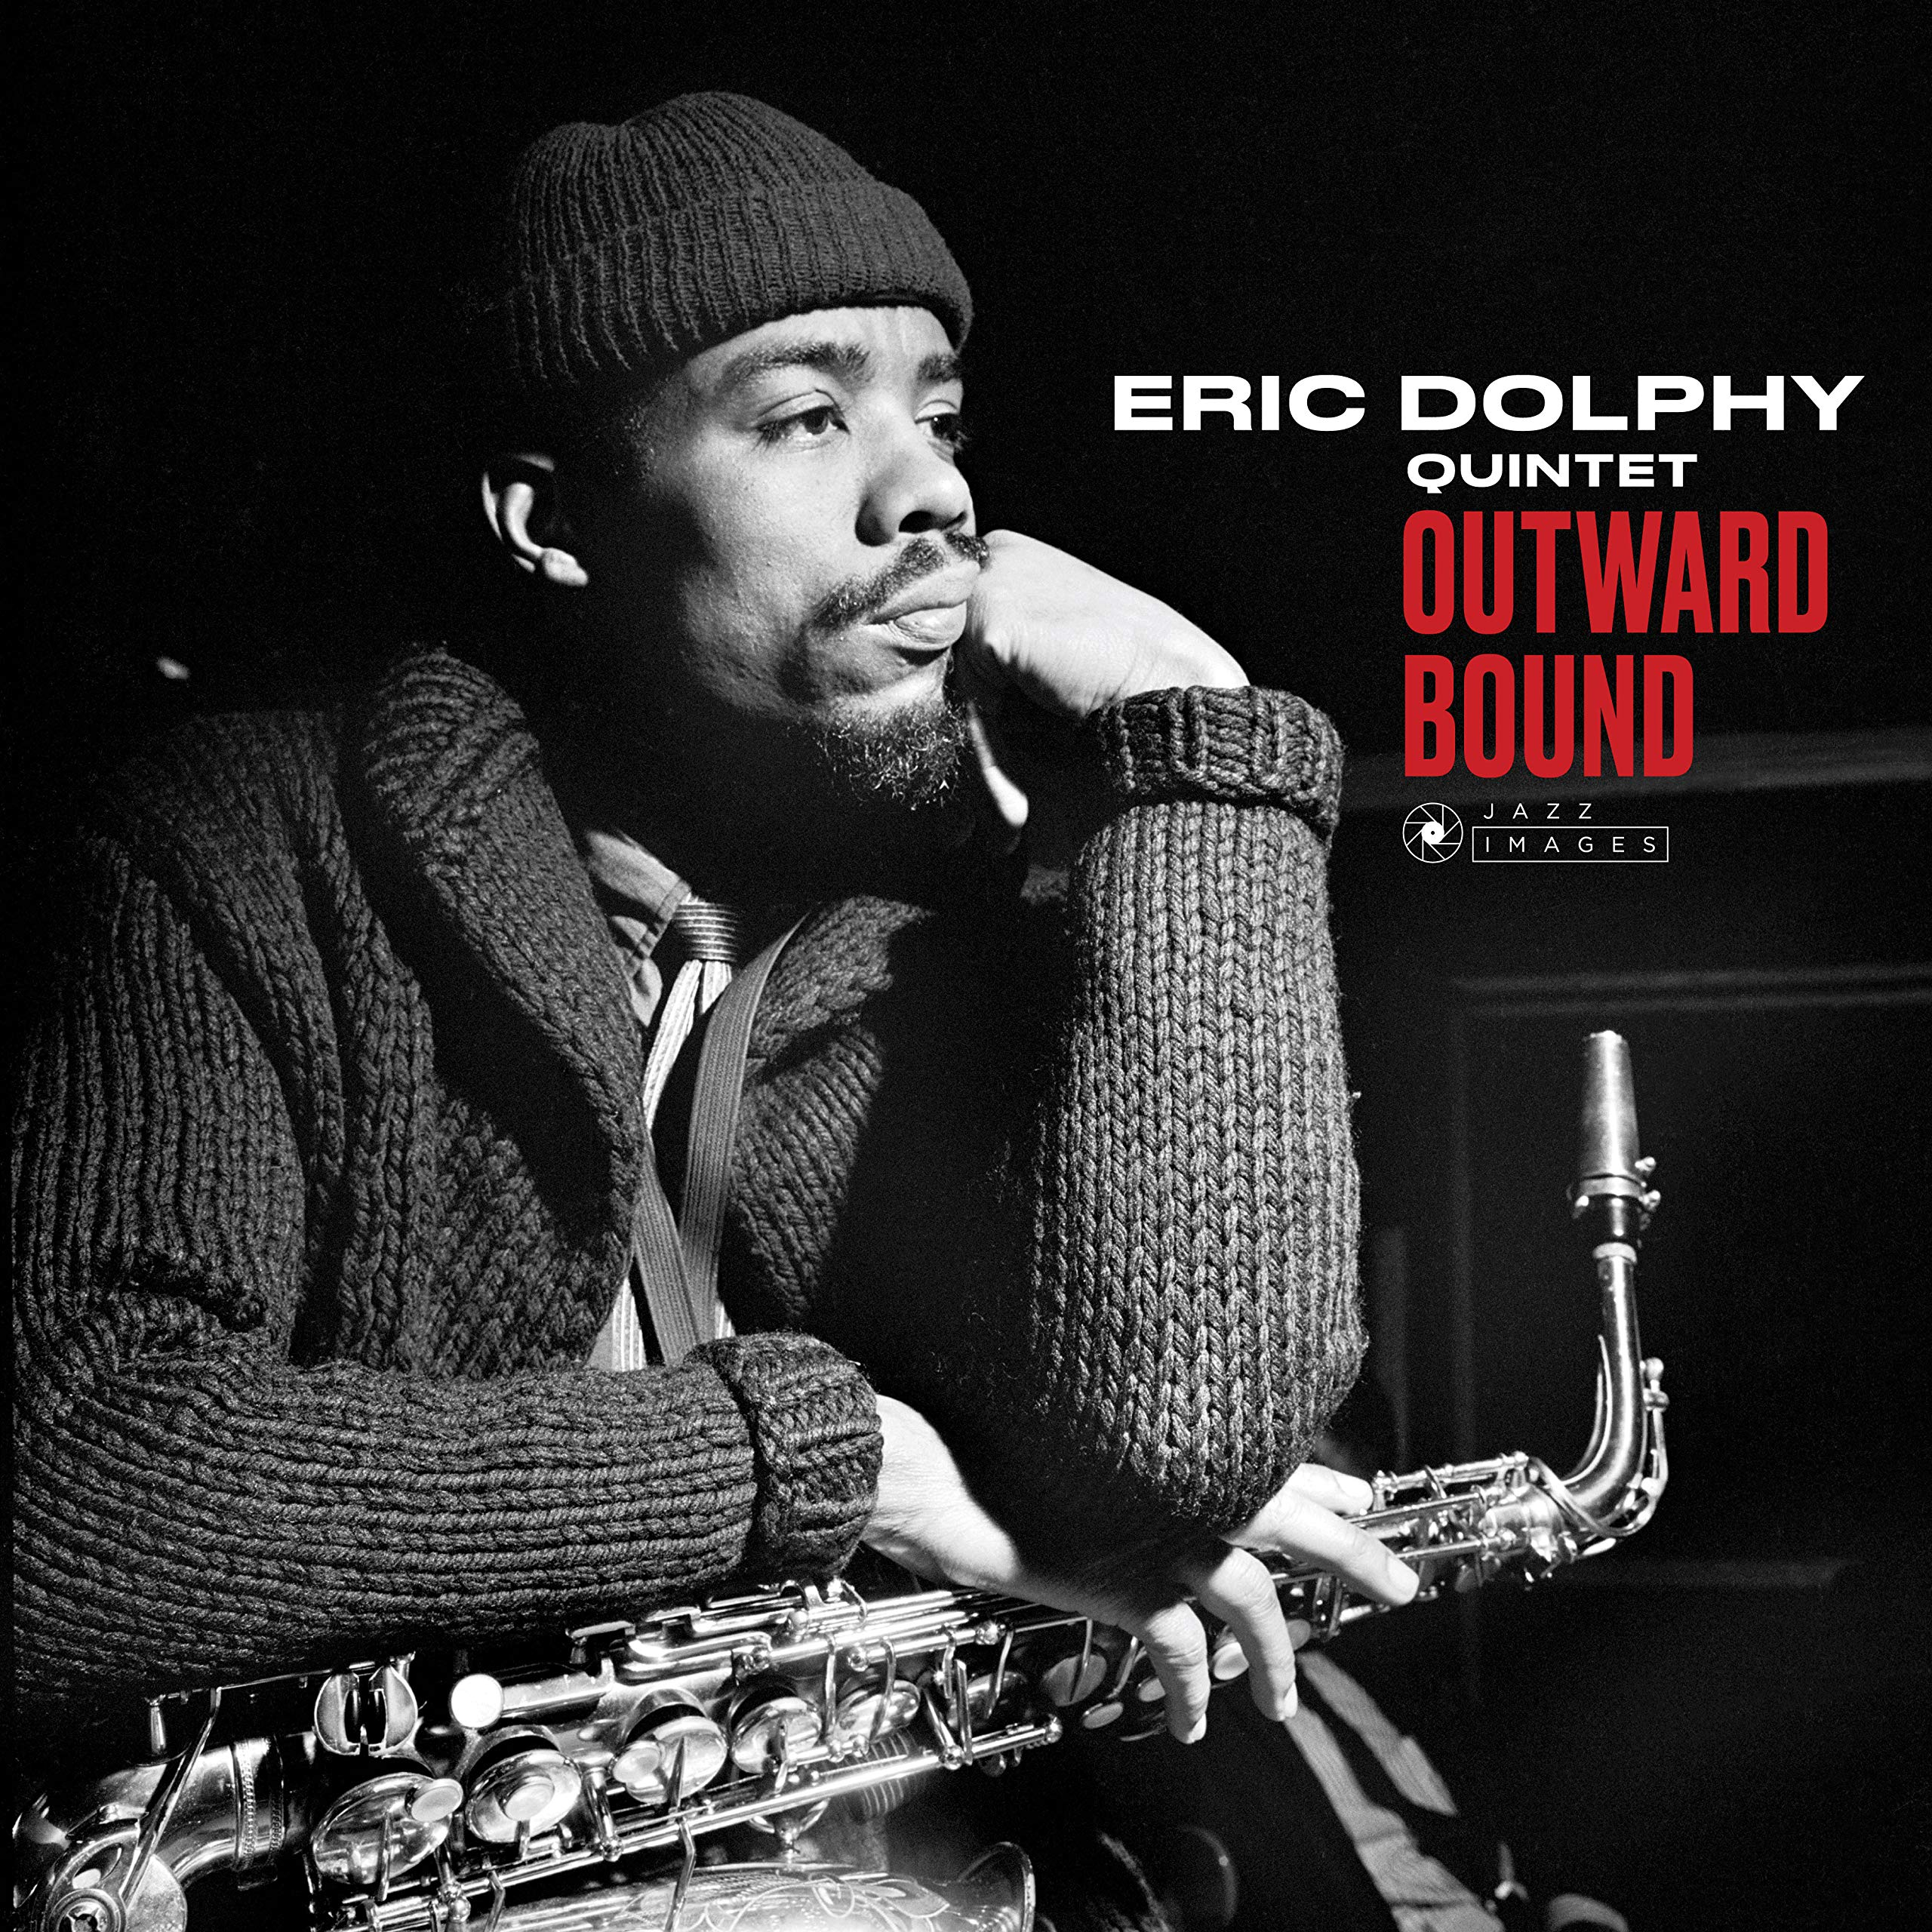 Vinilo : Eric Dolphy - Outward Bound (Bonus Tracks, Spain - Import)